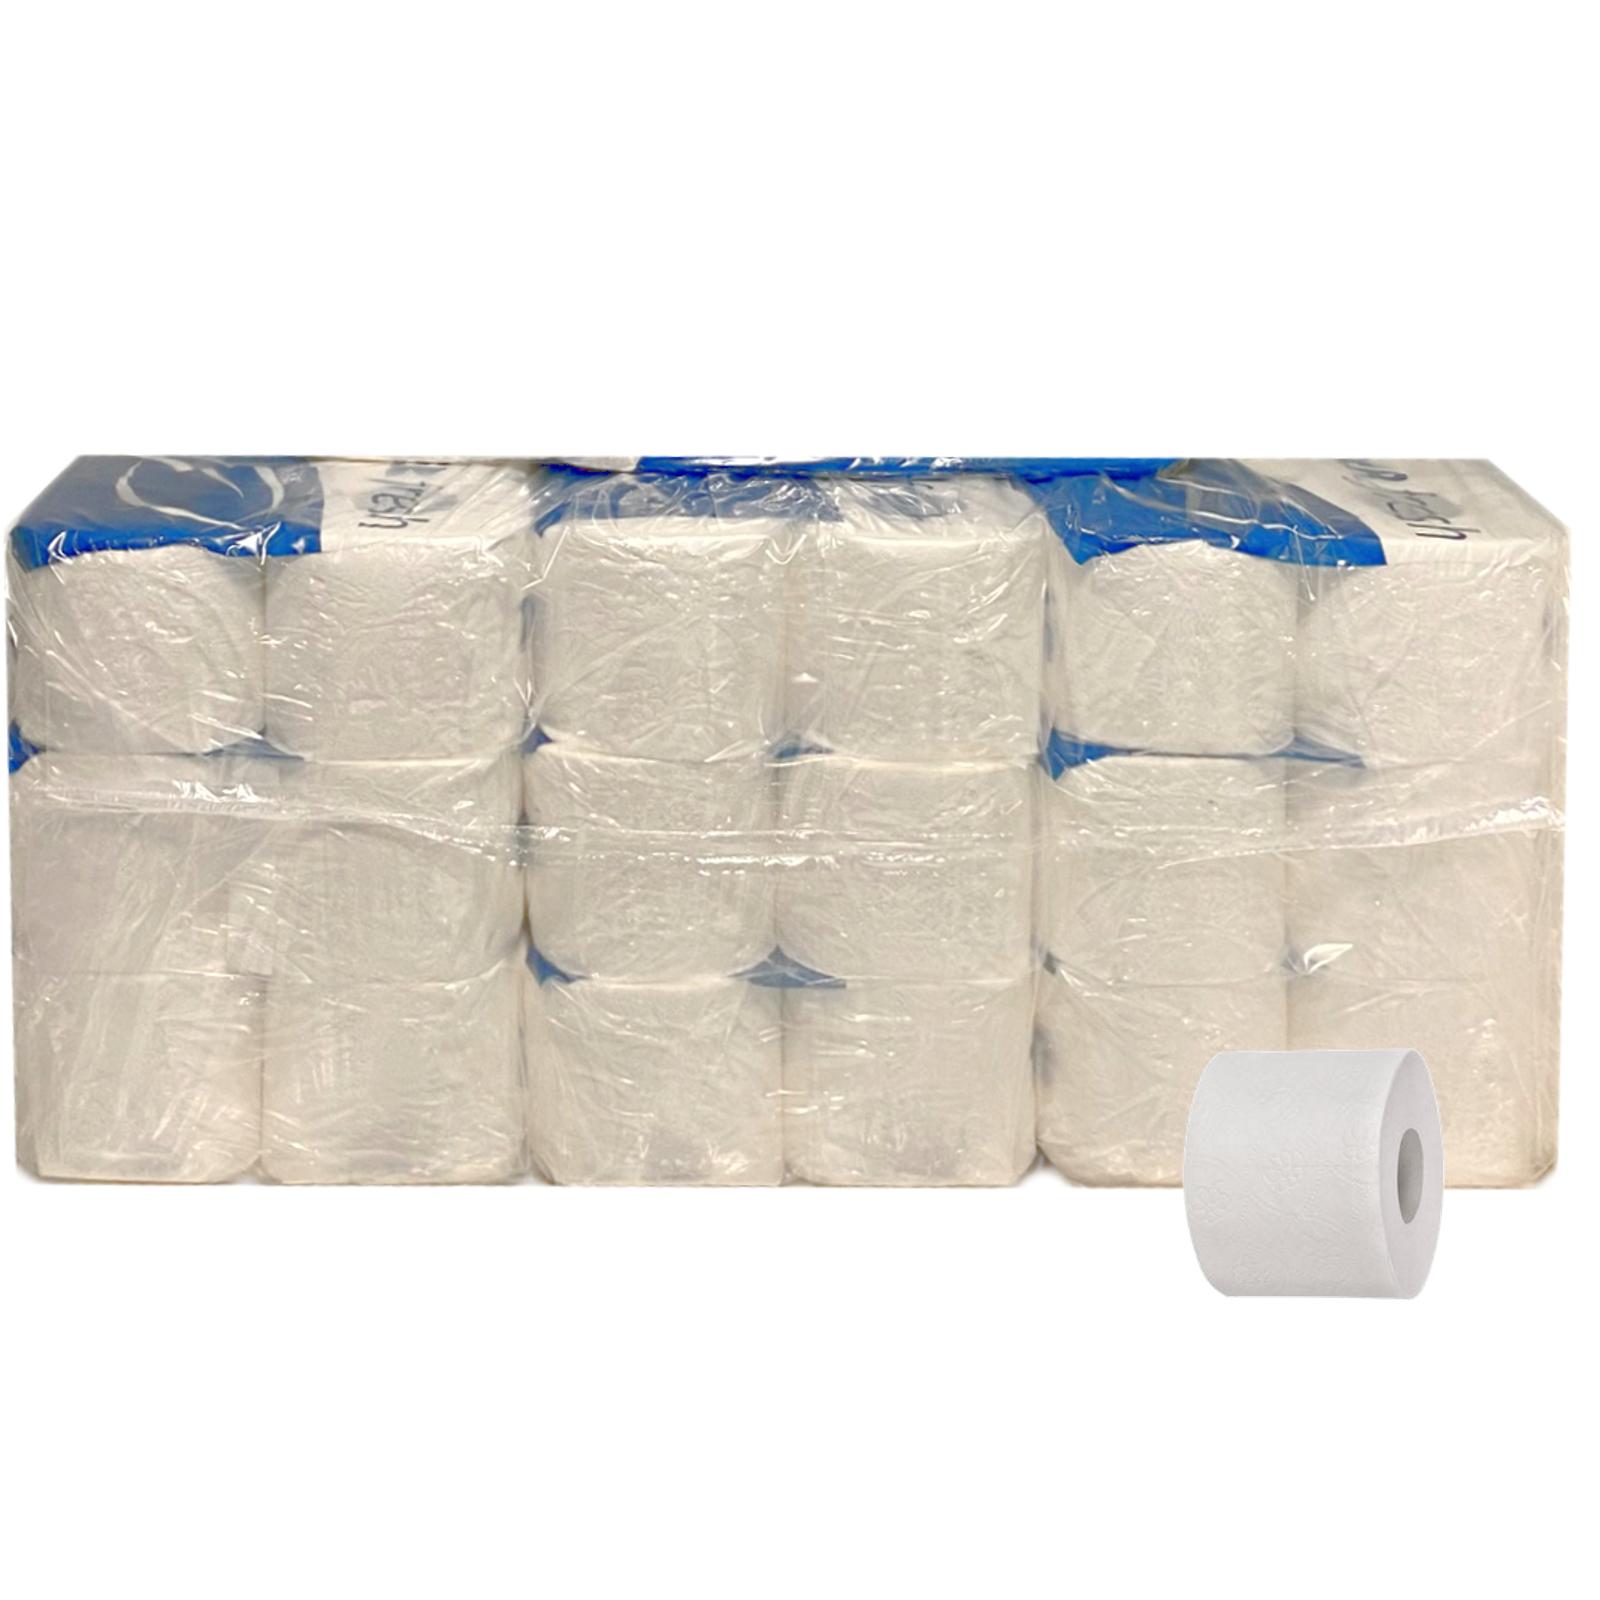 72 Rollen Toilettenpapier 3 lagig, 72x250 Blatt